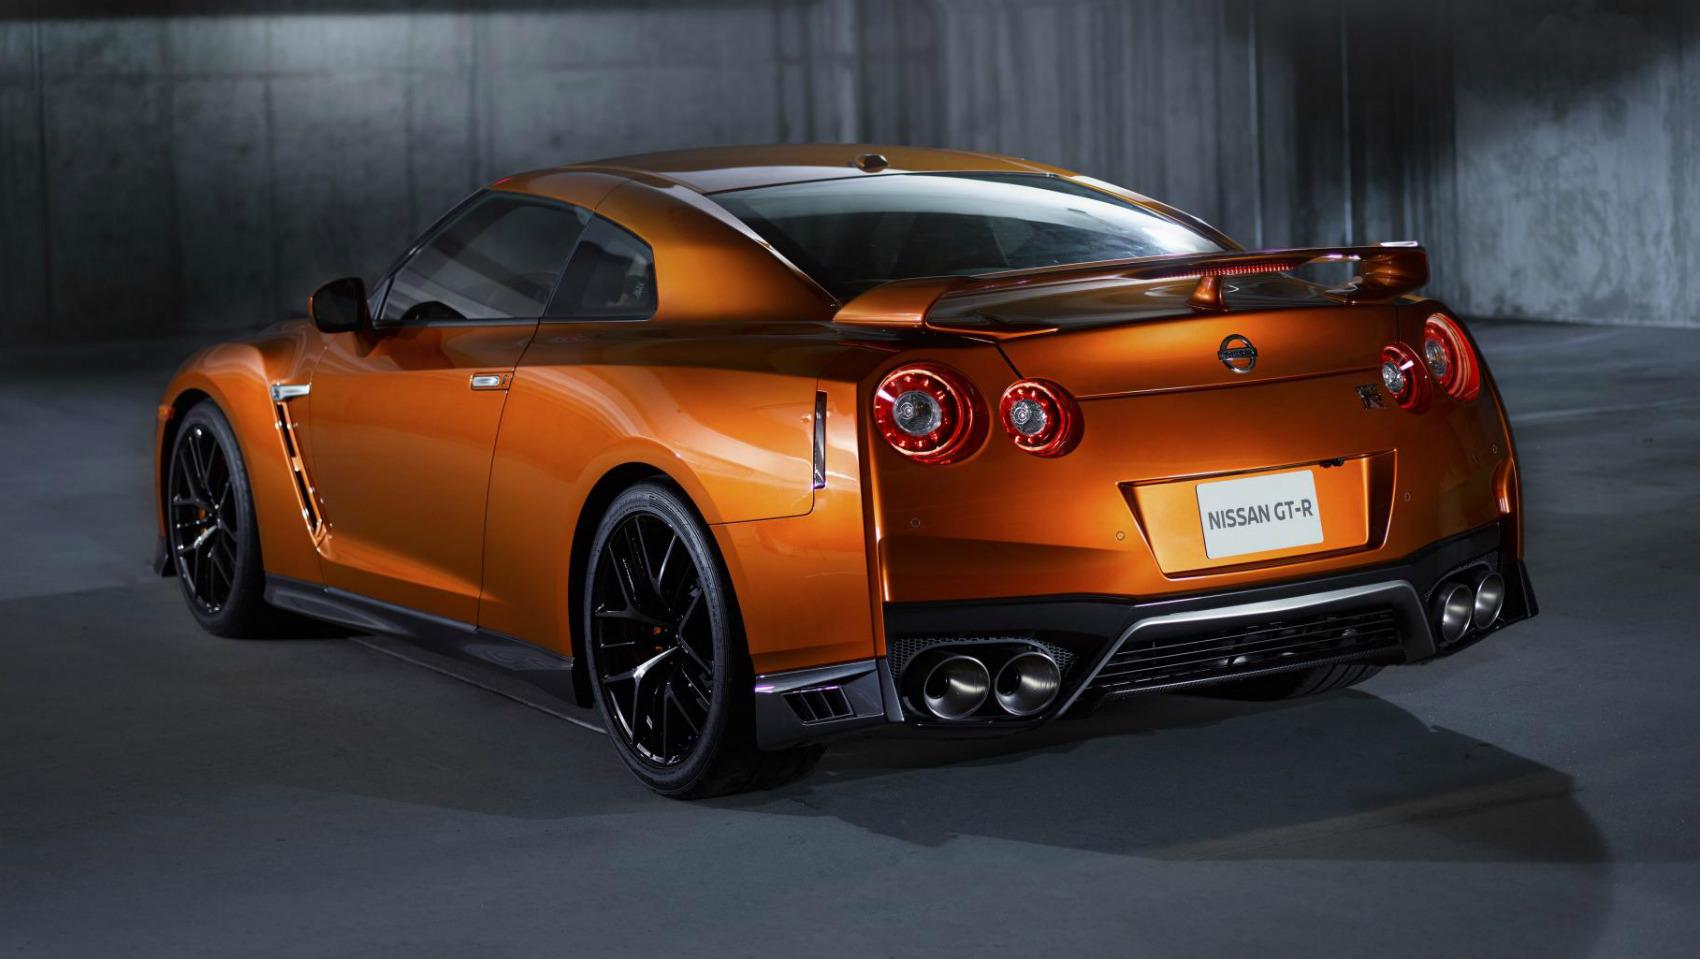 Nissan GT-R 2017 trasera